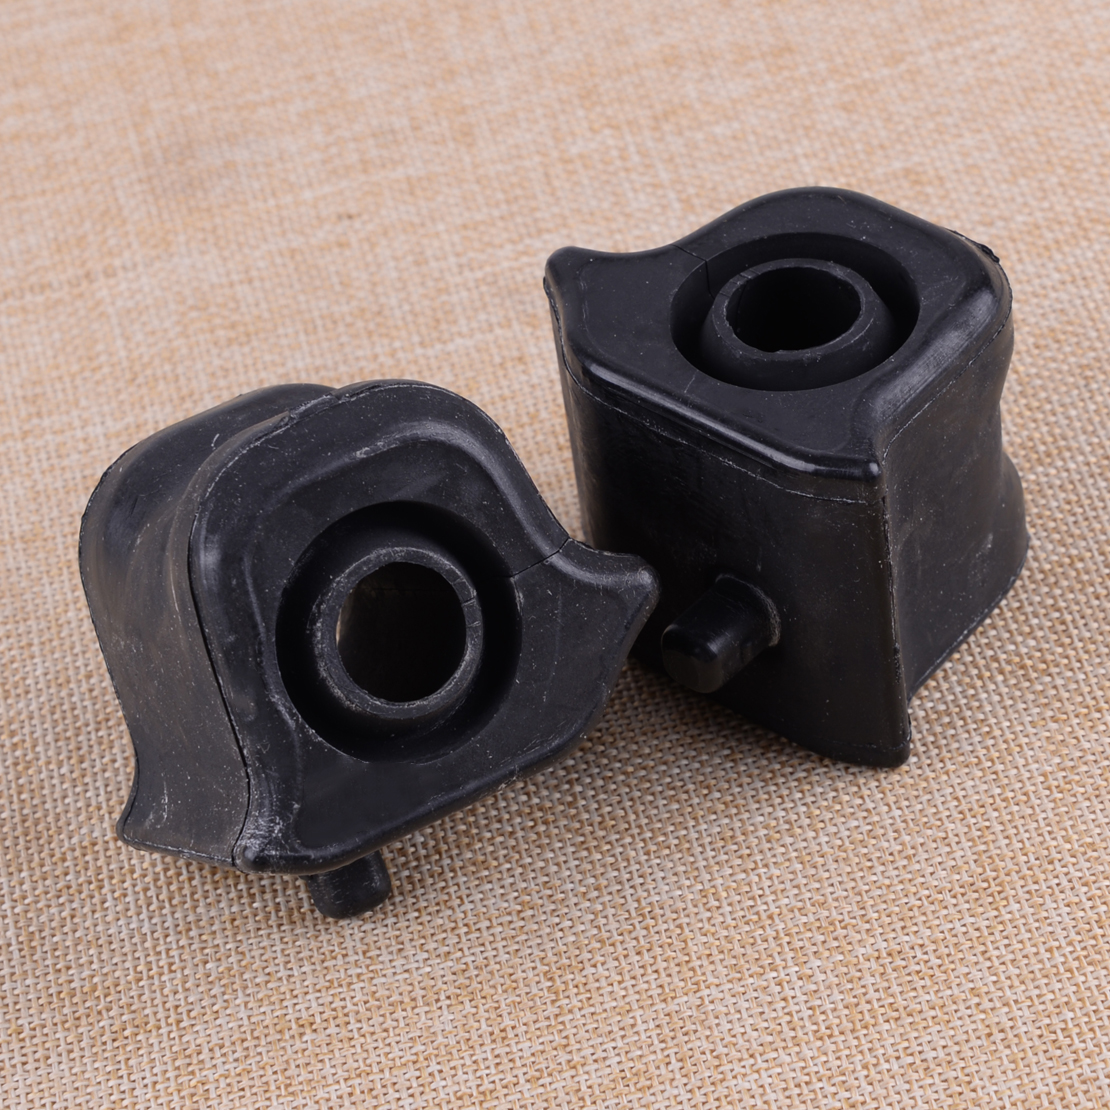 CITALL 48815-42090 48815-42100 Black 2pcs Left & Right Front Suspension Stabilizer Bar Bushing Fit For Toyota RAV4 2006-2012